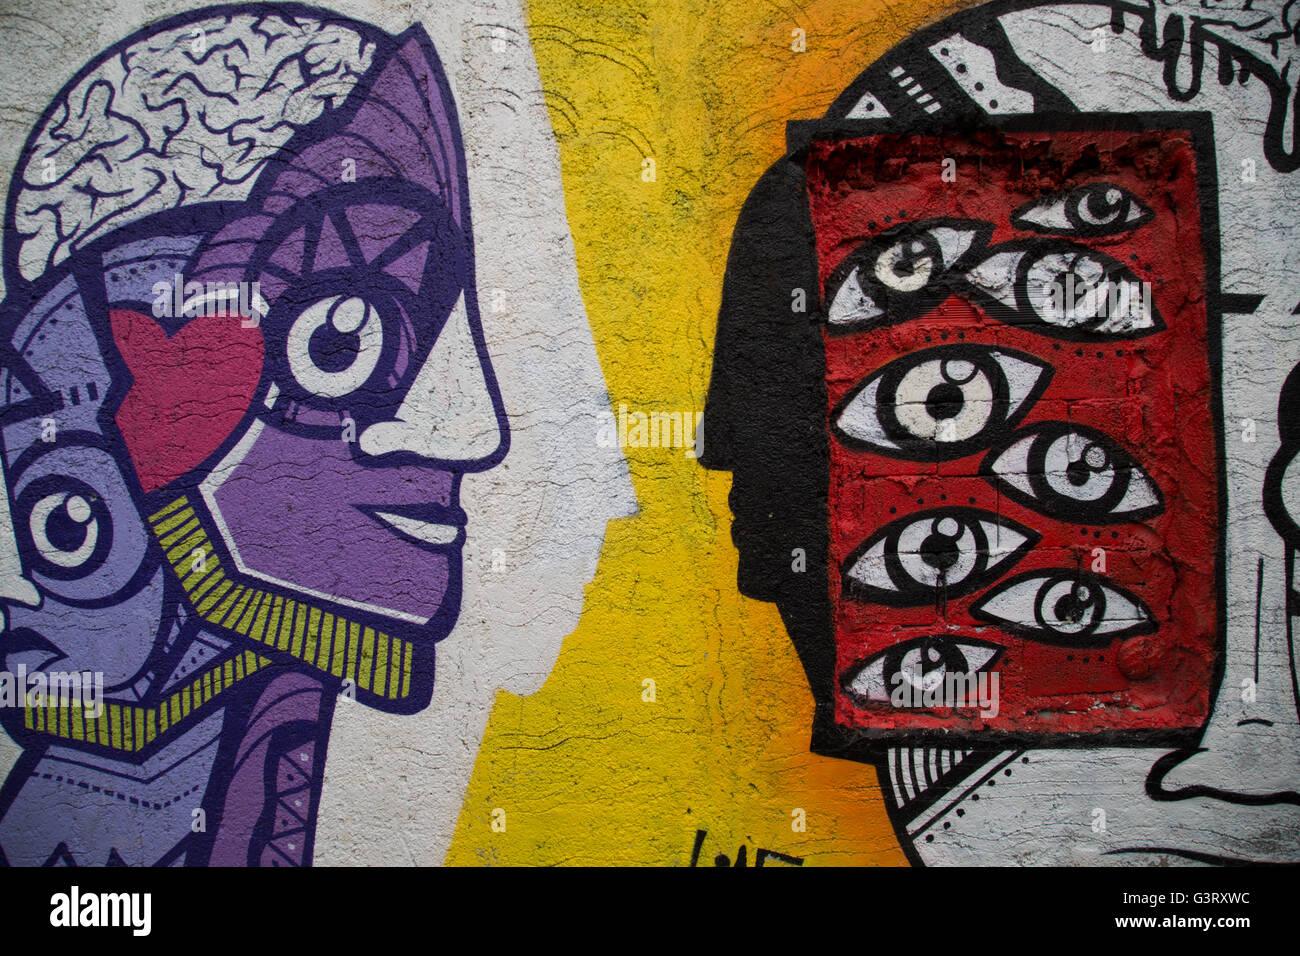 Street art (graffiti) in the alleys of the scenic neighborhood of Anafiotika in Athens, Greece. Stock Photo